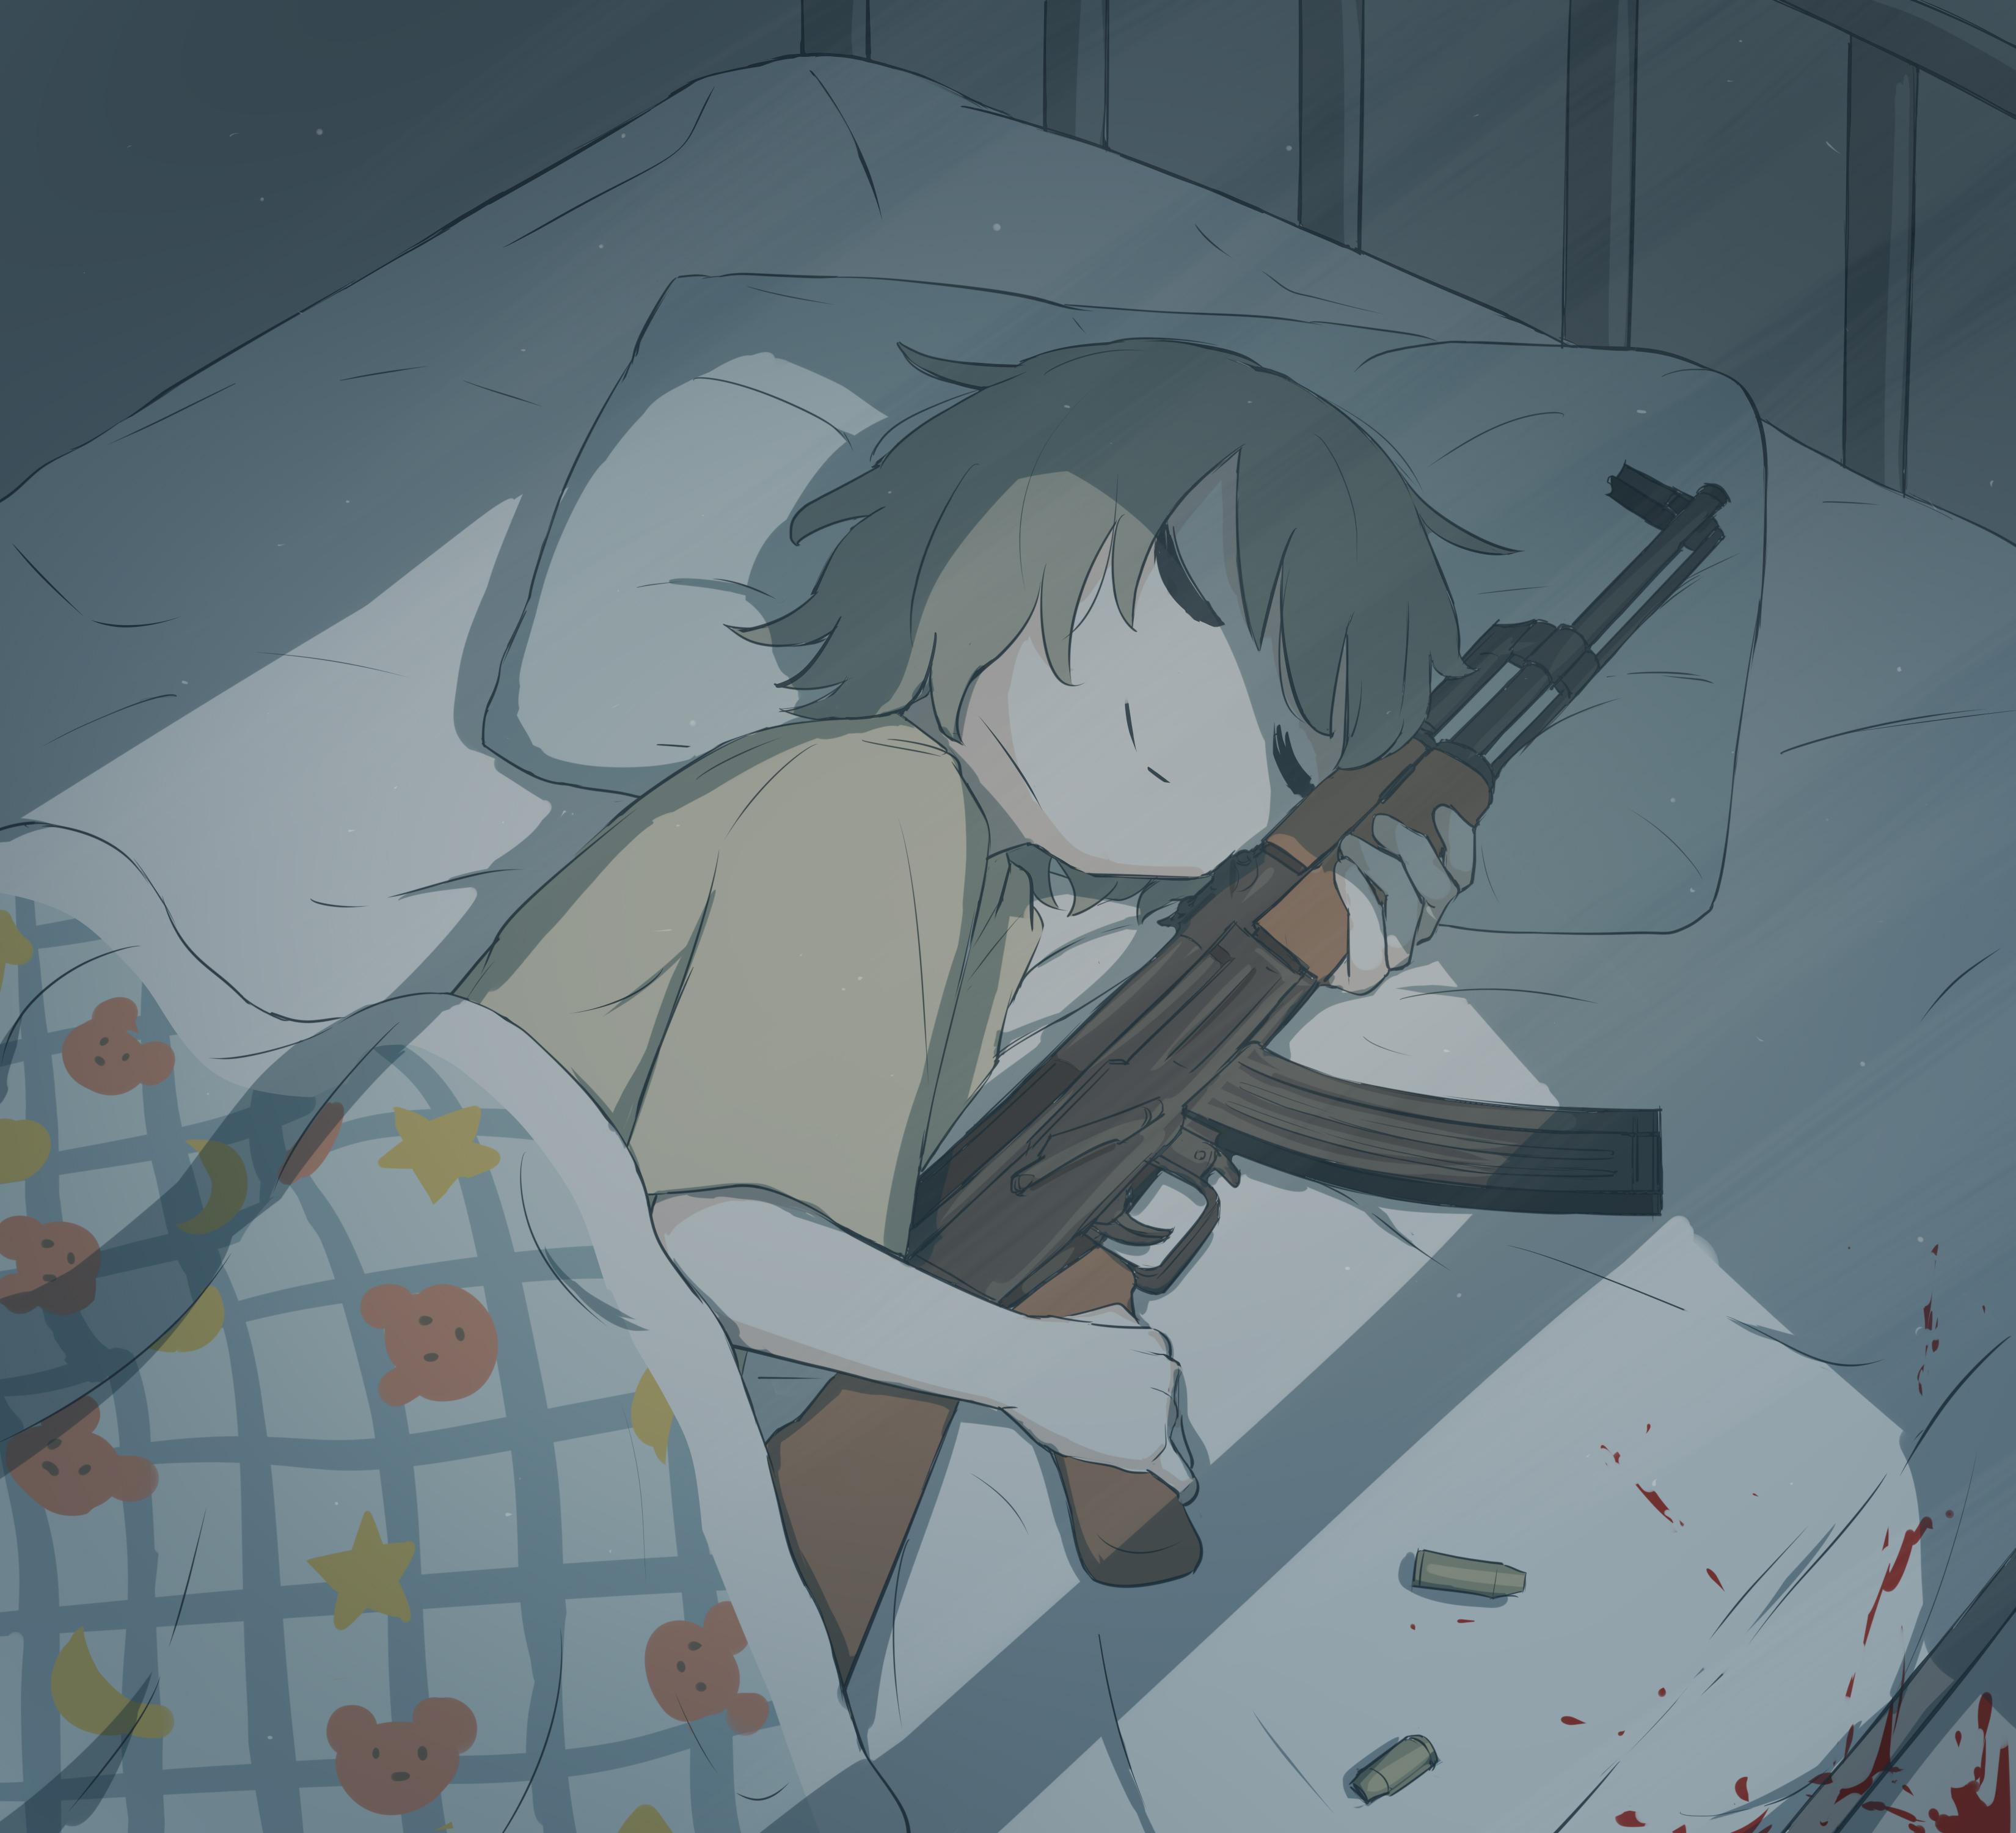 itotii-アボガド6 - 抱き枕